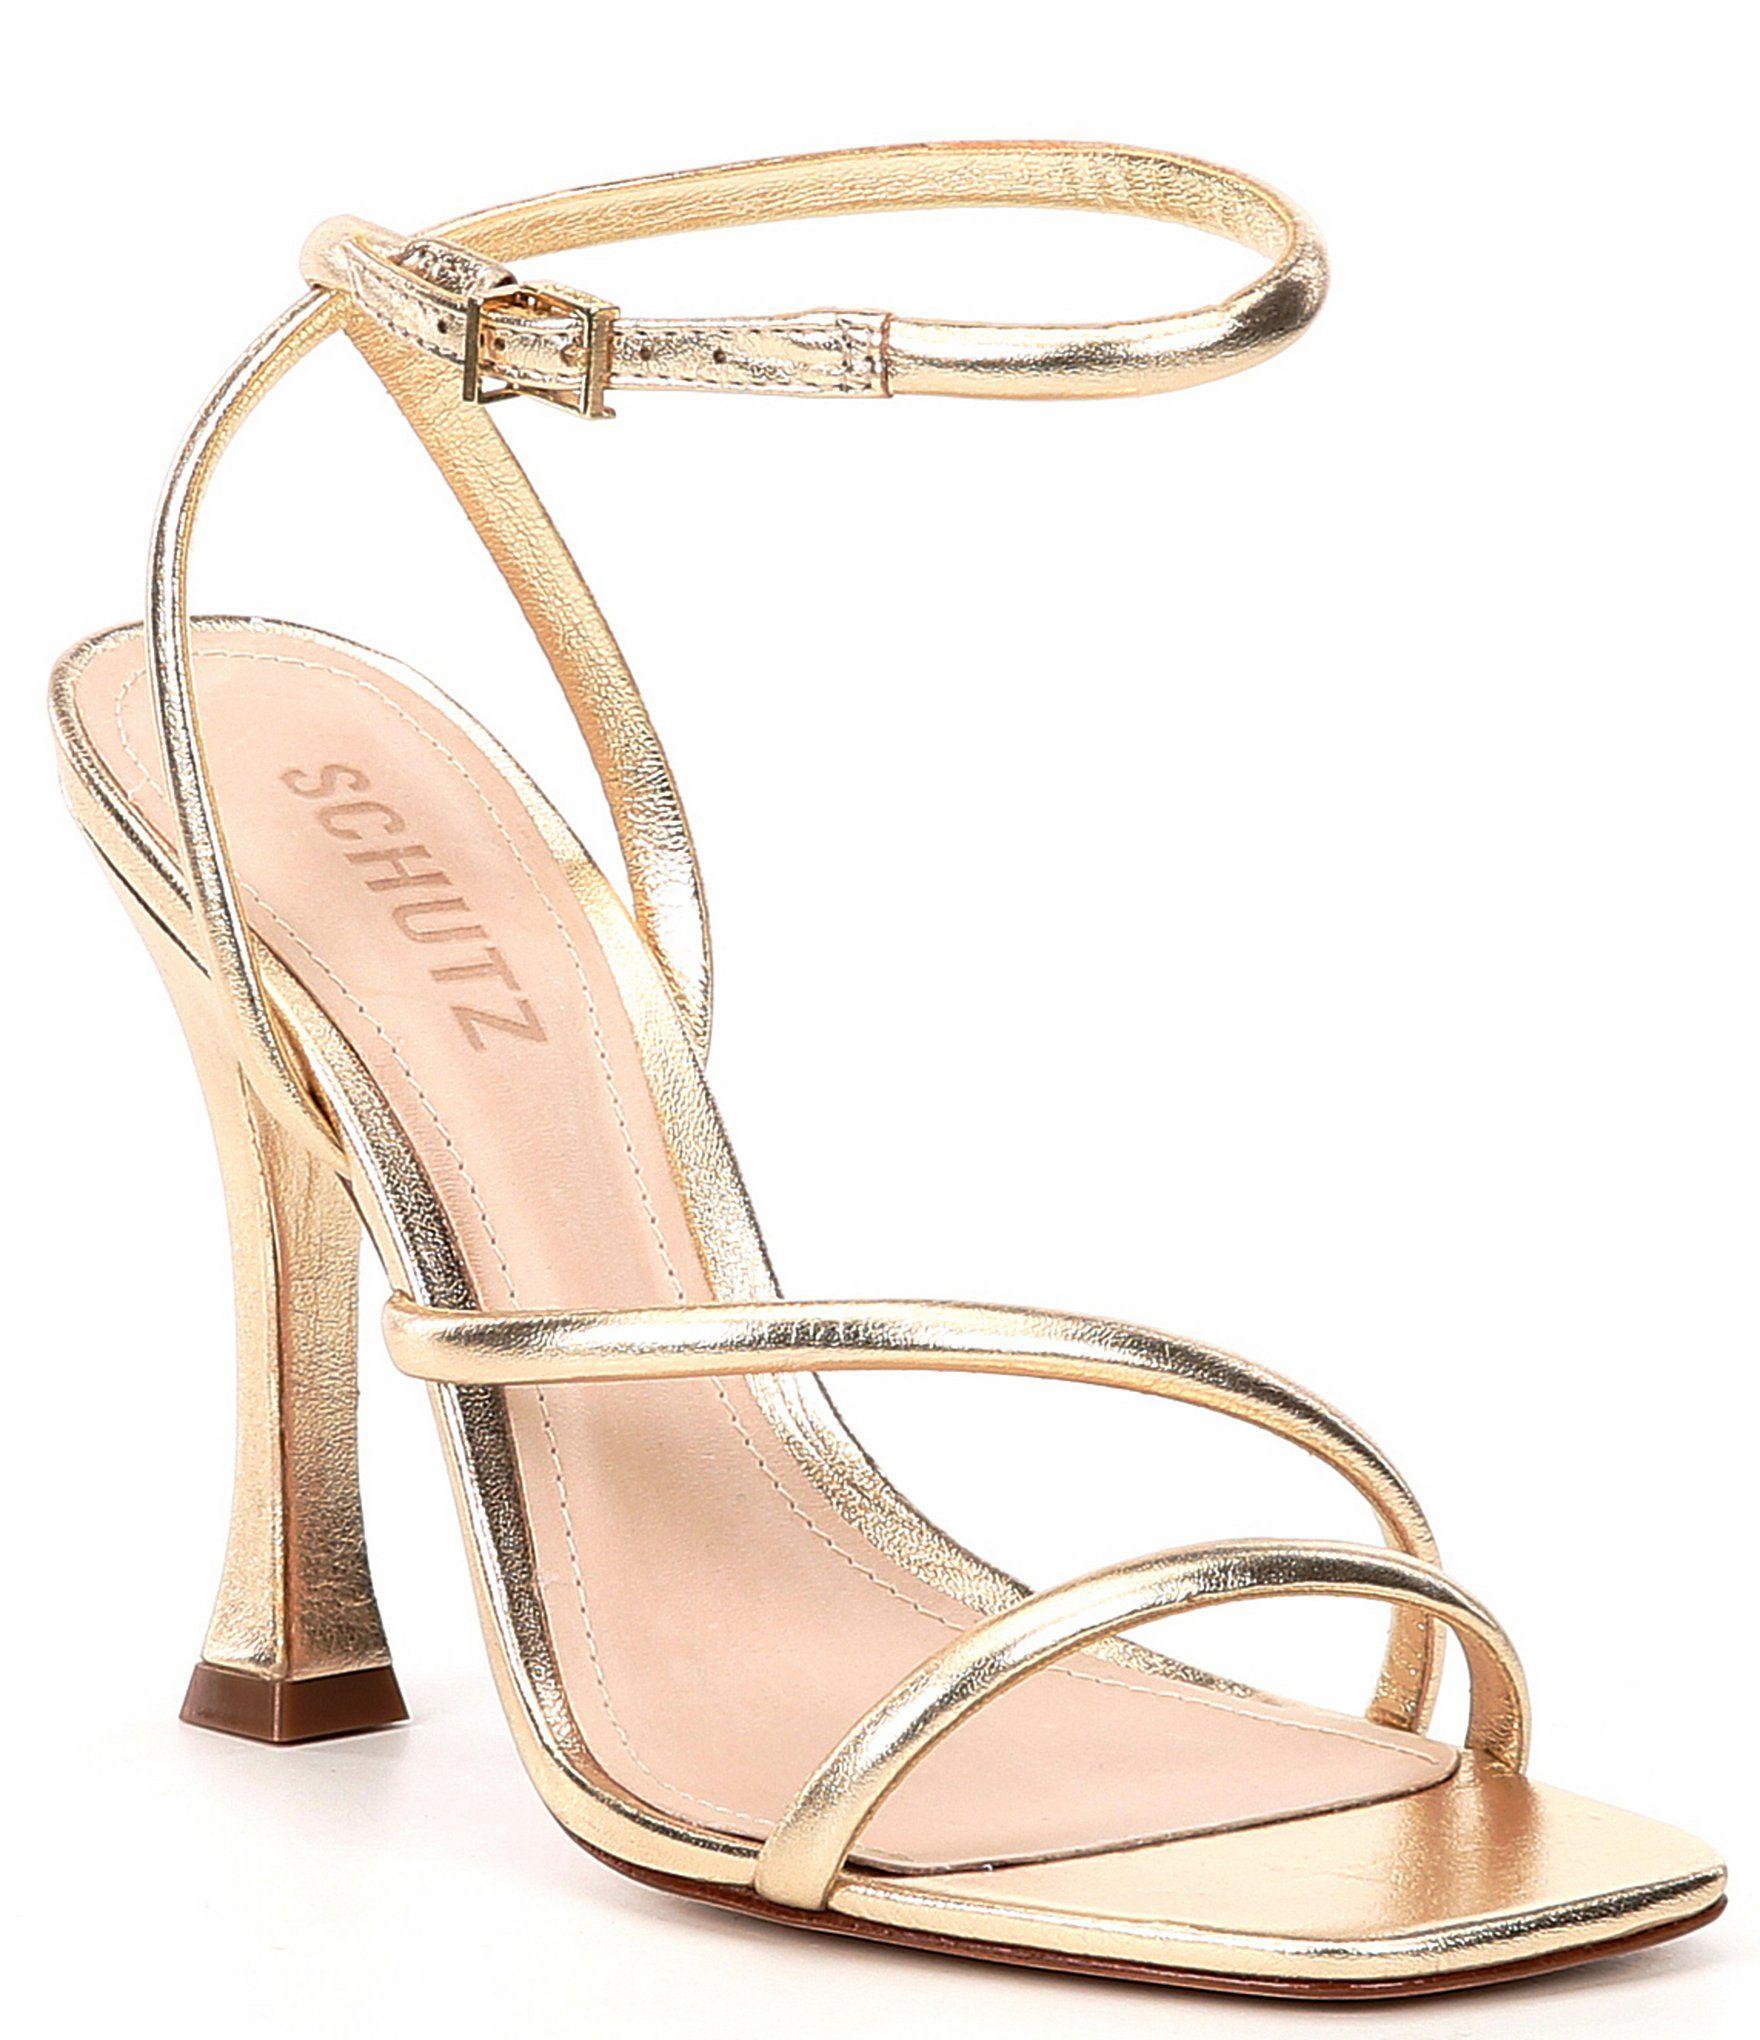 Schutz Polaina Square Toe Metallic Leather Dress Sandals - 7.5M